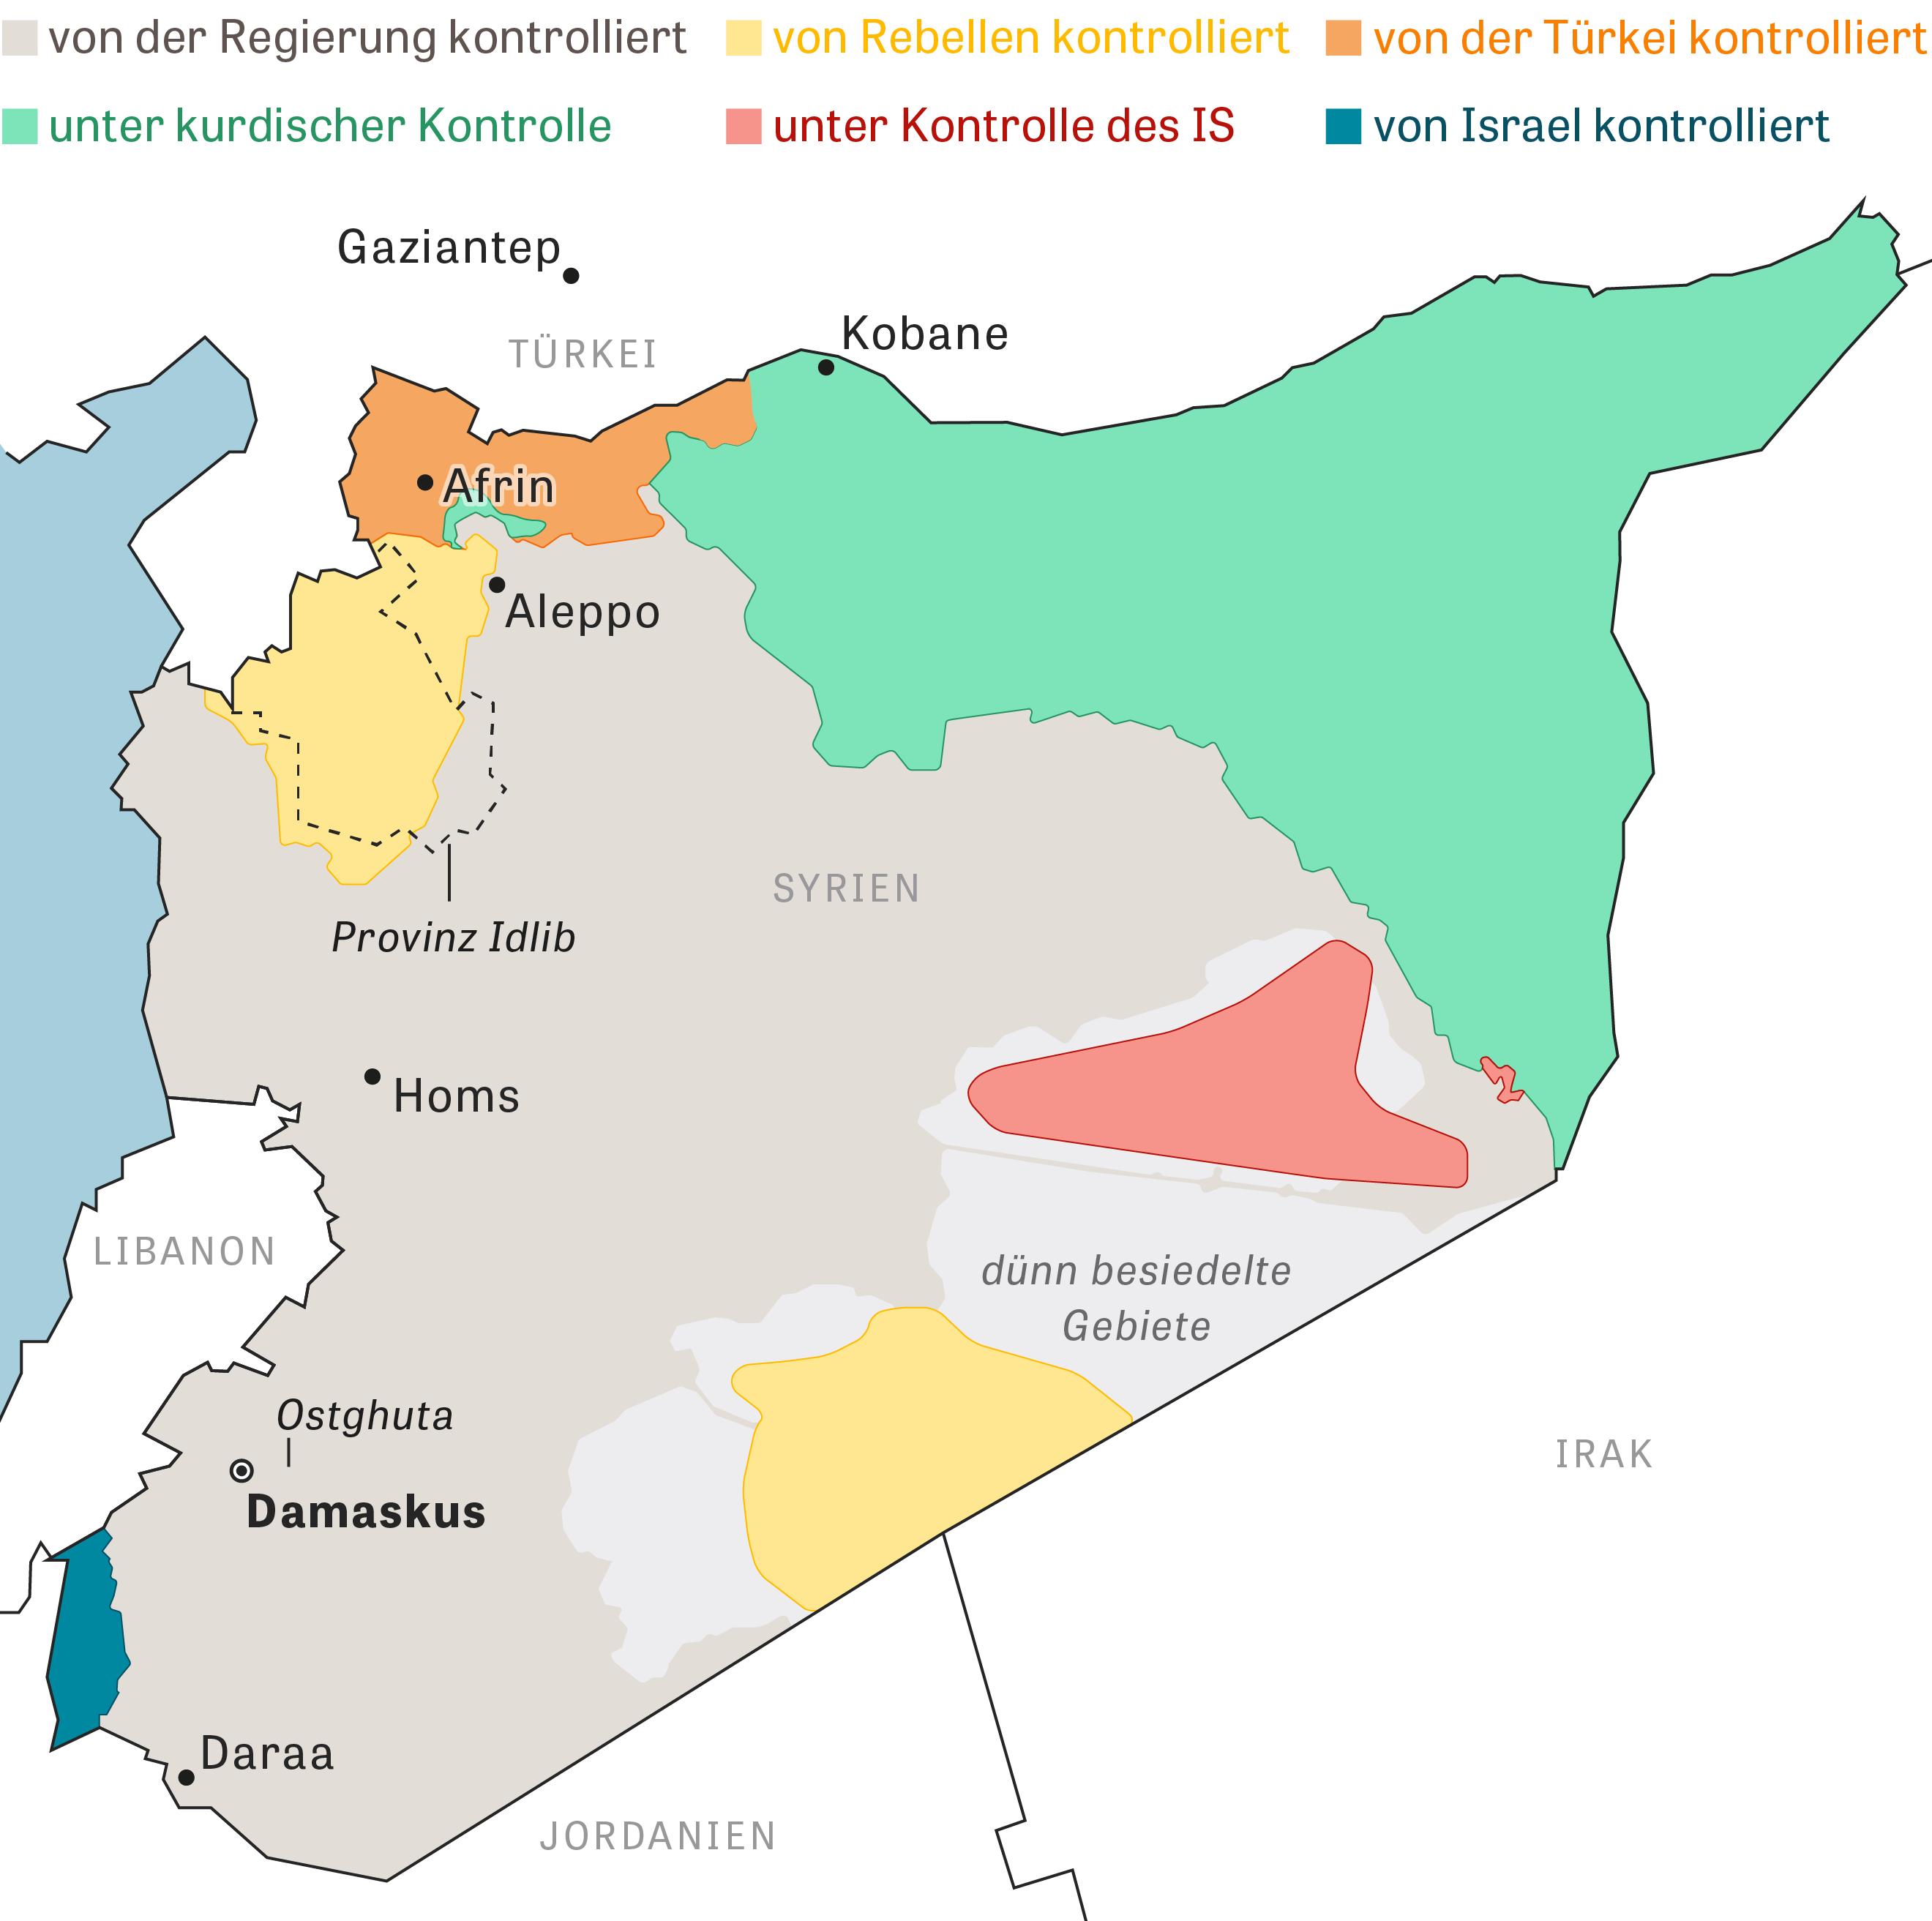 Die Situation in Syrien